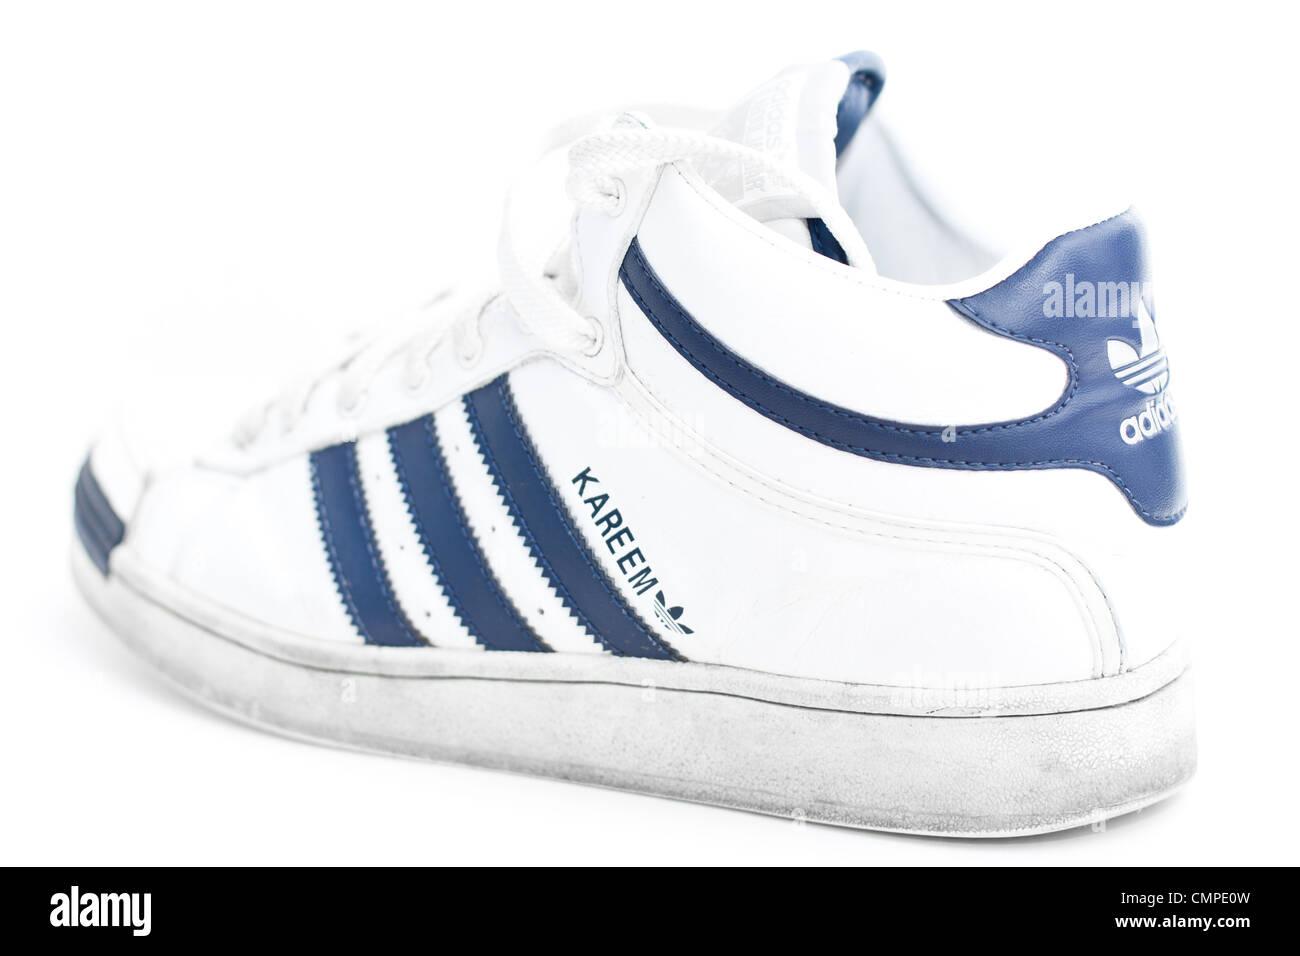 Adidas Originals Kareem Abdul Jabbar chaussure. Adidas